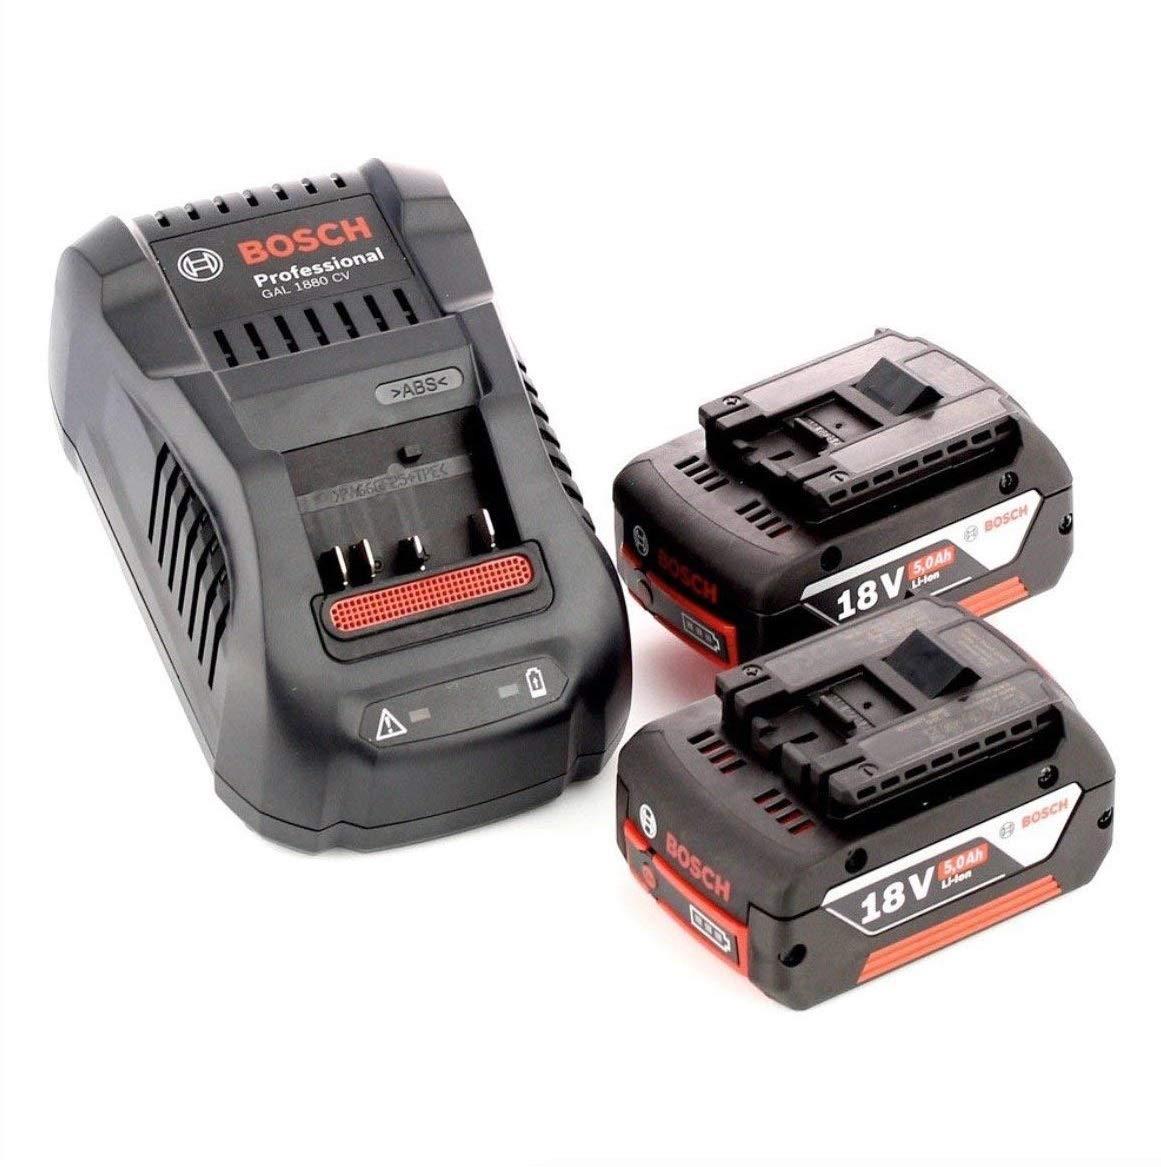 Bosch-Professional-Akku-Bohrhammer-GSB-18-V-85-C-2-x-50Ah-Batterien-18V-Robust-in-L-BOXX